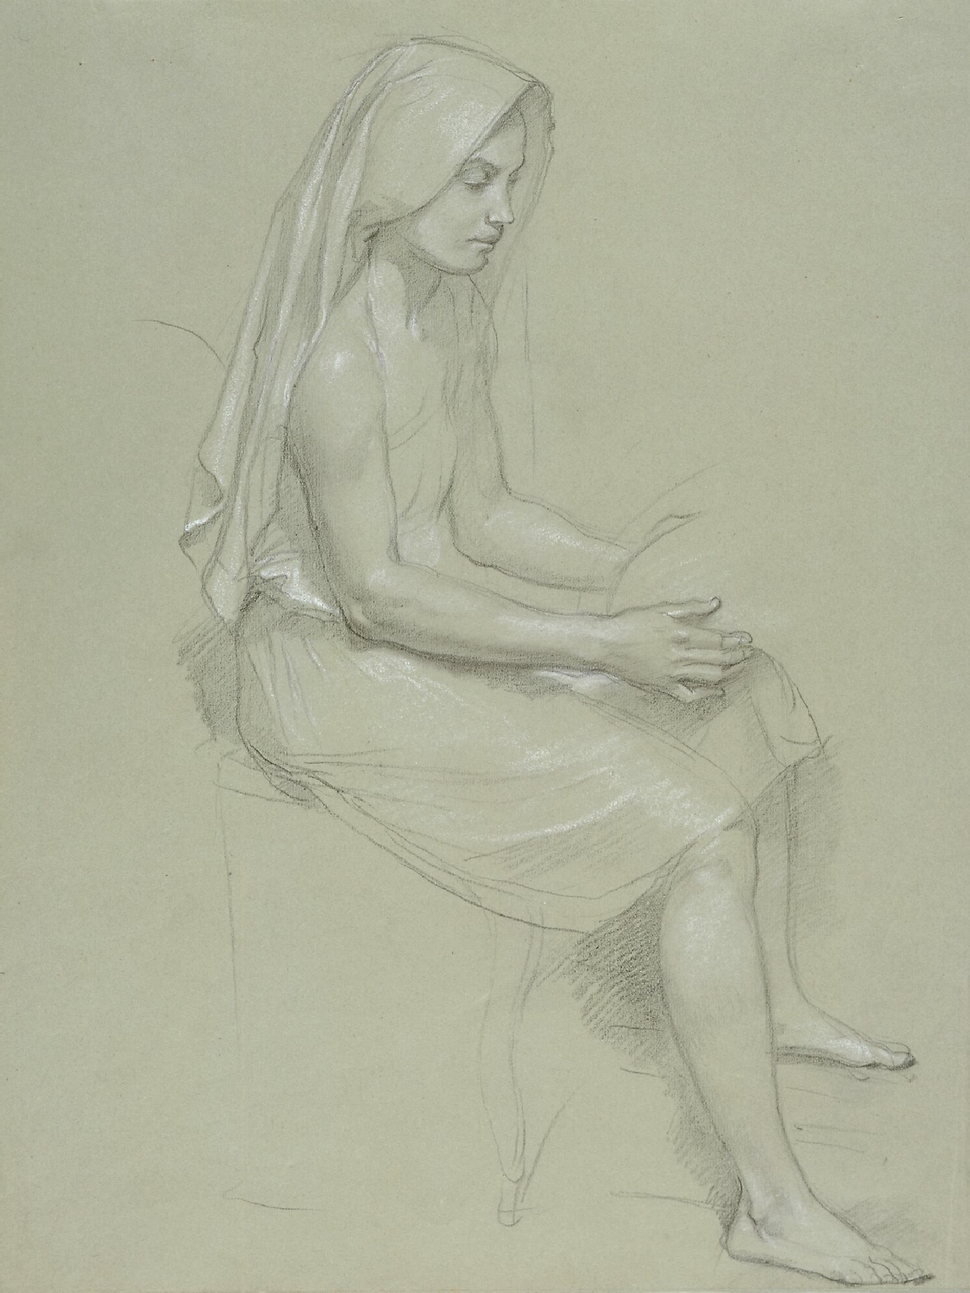 William-Adolphe Bouguereau (1825-1905) - Study of a Seated Veiled Female Figure (19th Century)